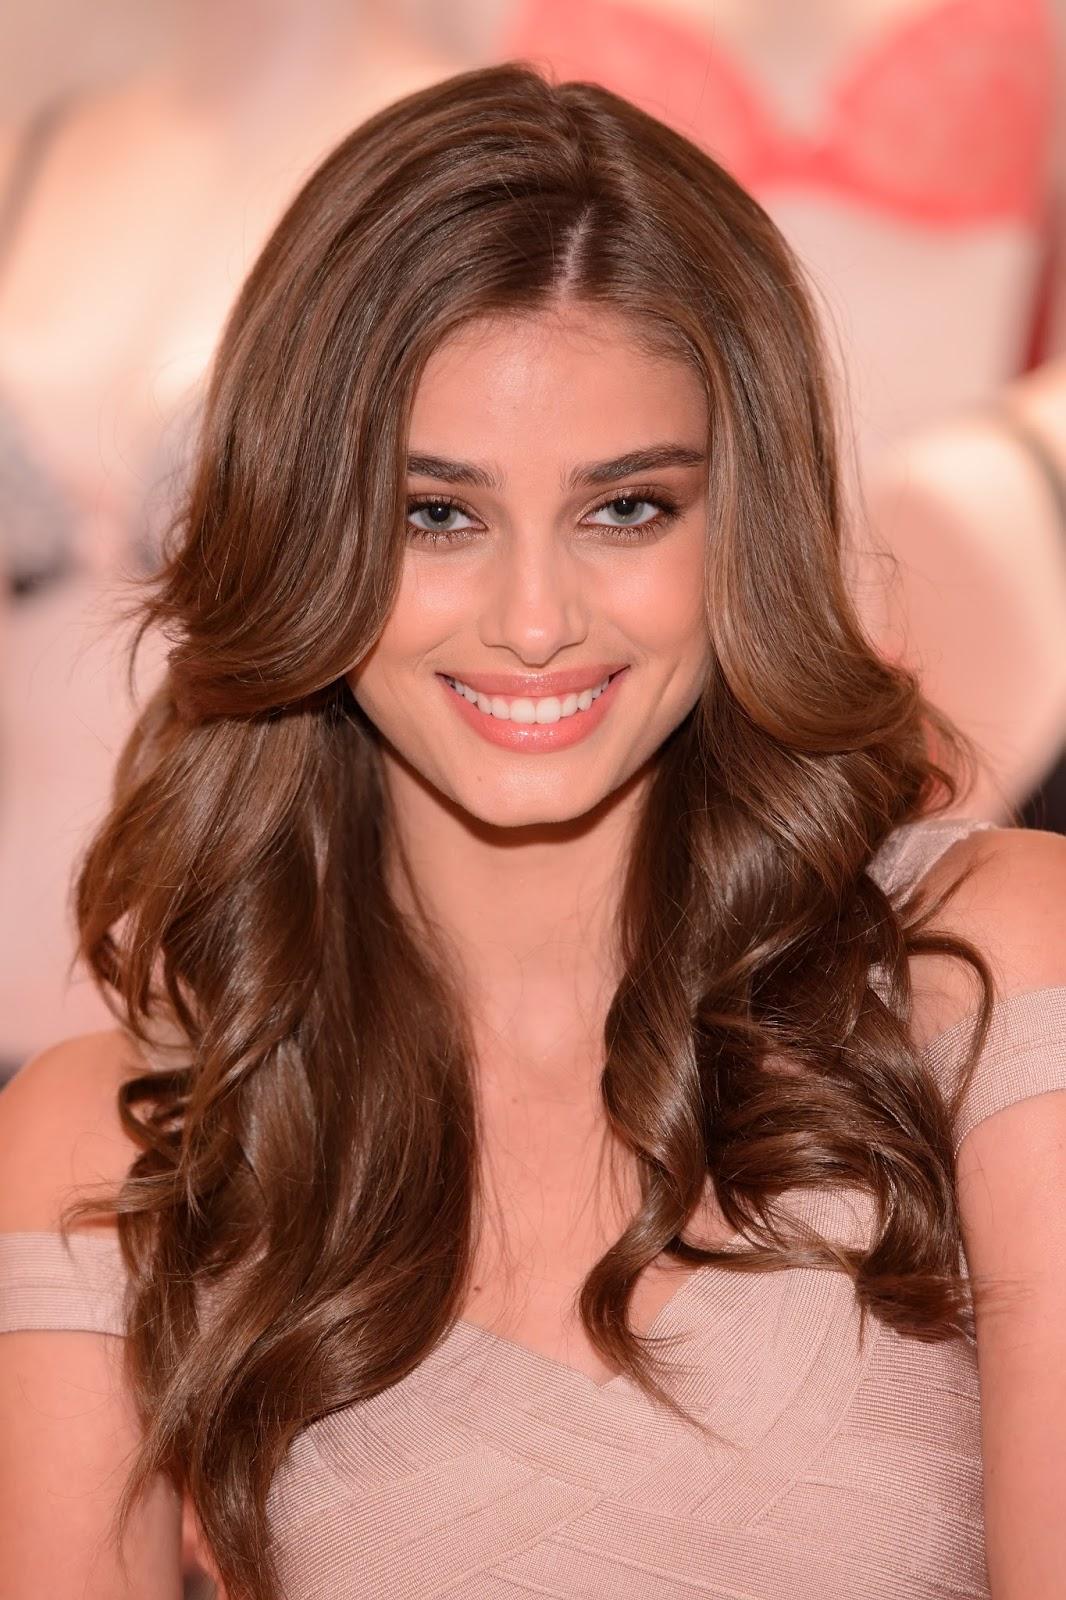 haykhota.com: Fashion Model @ Taylor Marie Hill - Body by Victoria Launch Tour